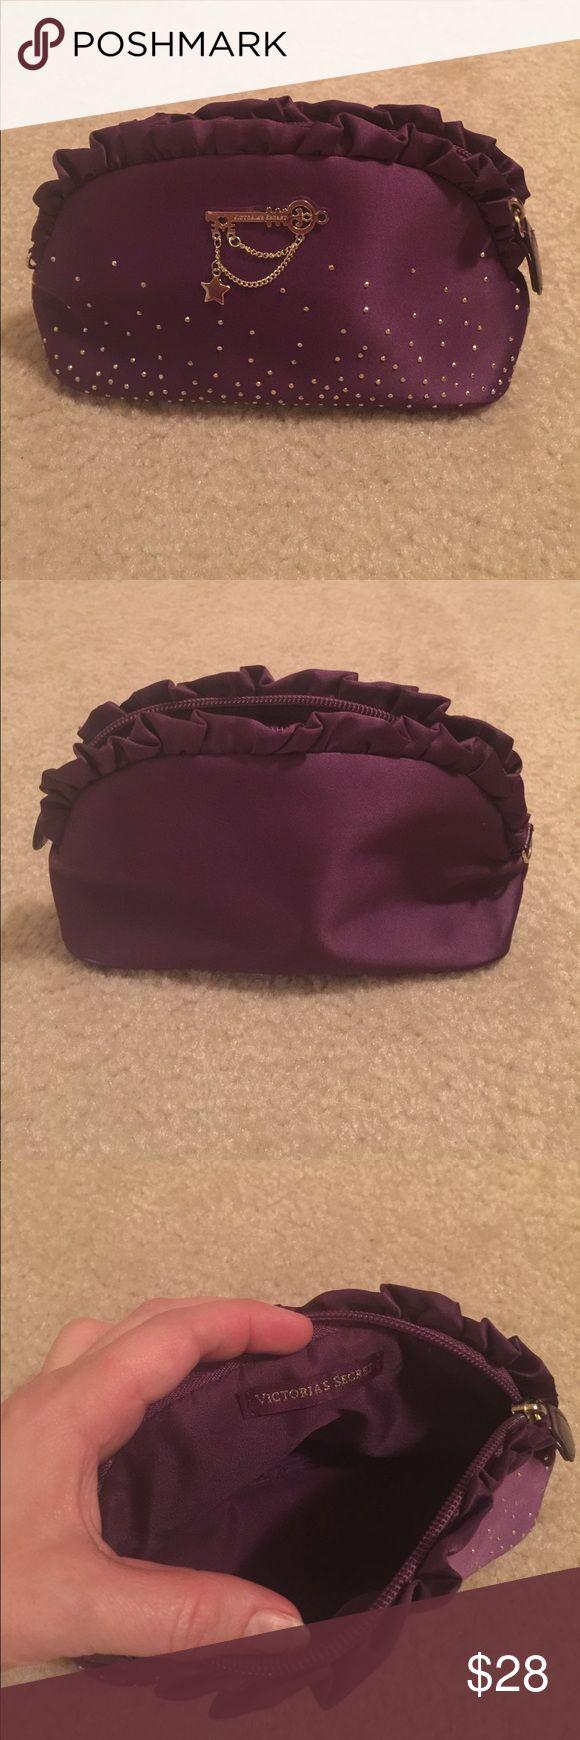 Victoria's Secret purple clutch bag Victoria's Secret purple clutch or makeup bag with gold details. Used twice. No marks or dirt. Victoria's Secret Bags Clutches & Wristlets